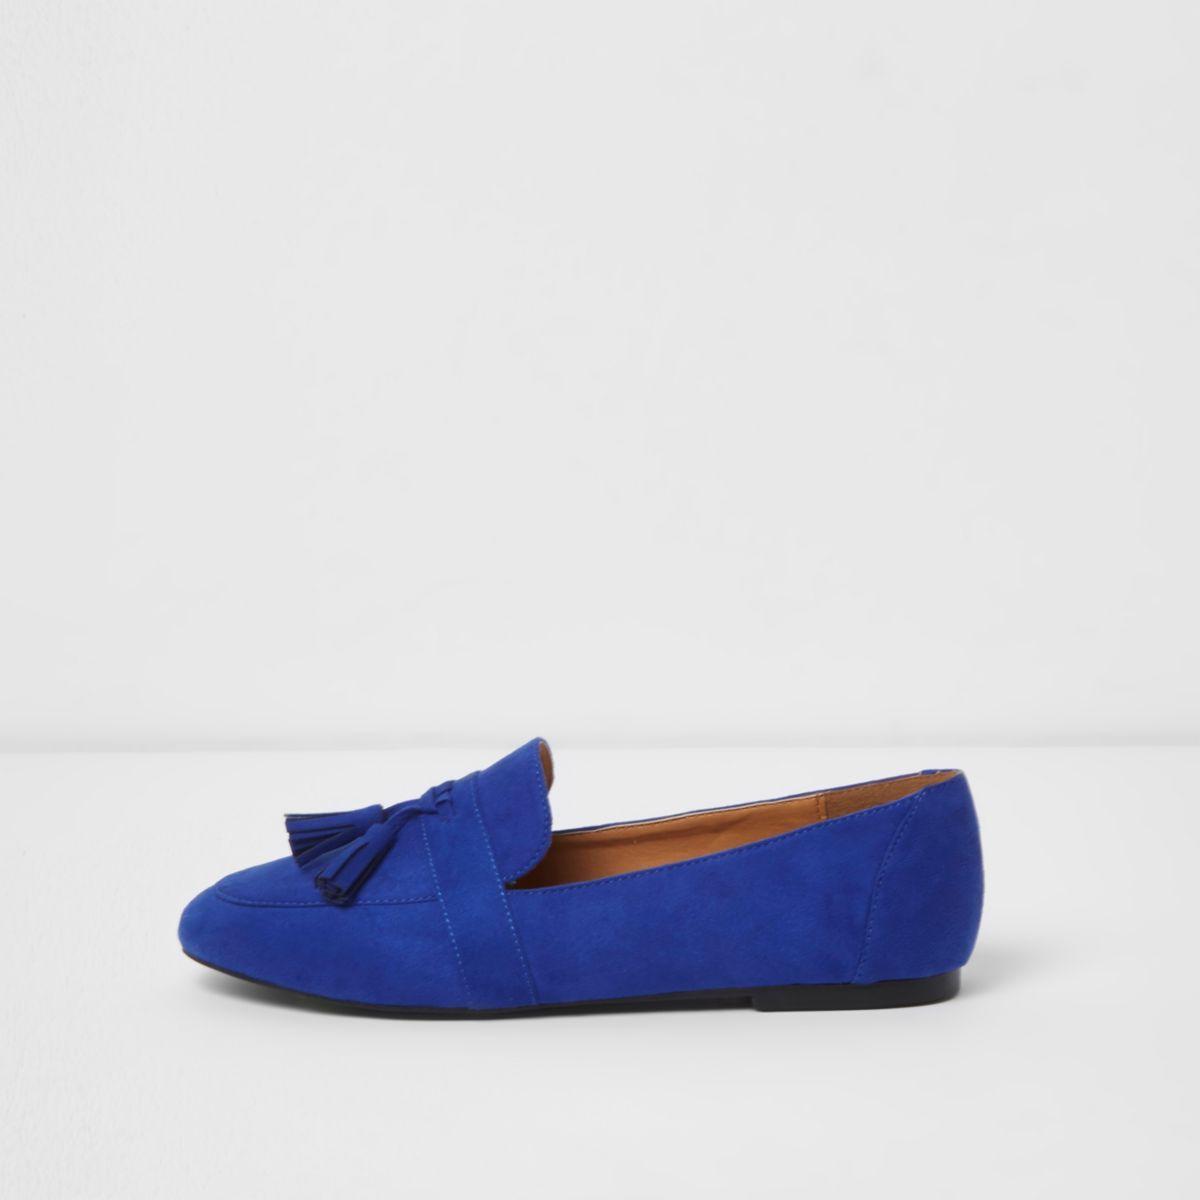 Kobaltblauwe loafers met kwastjes